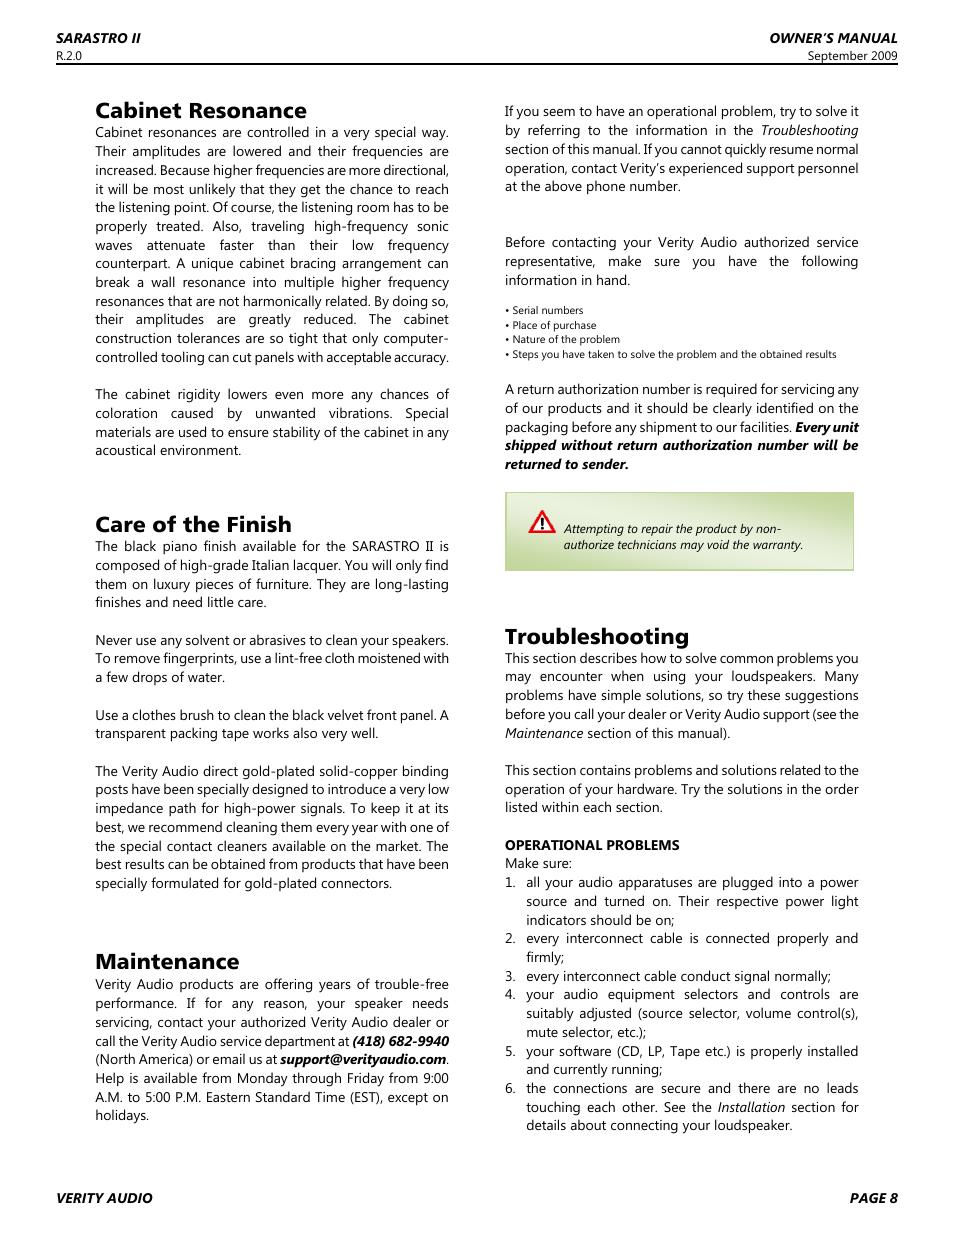 Cabinet resonance, Care of the finish, Maintenance | Verity